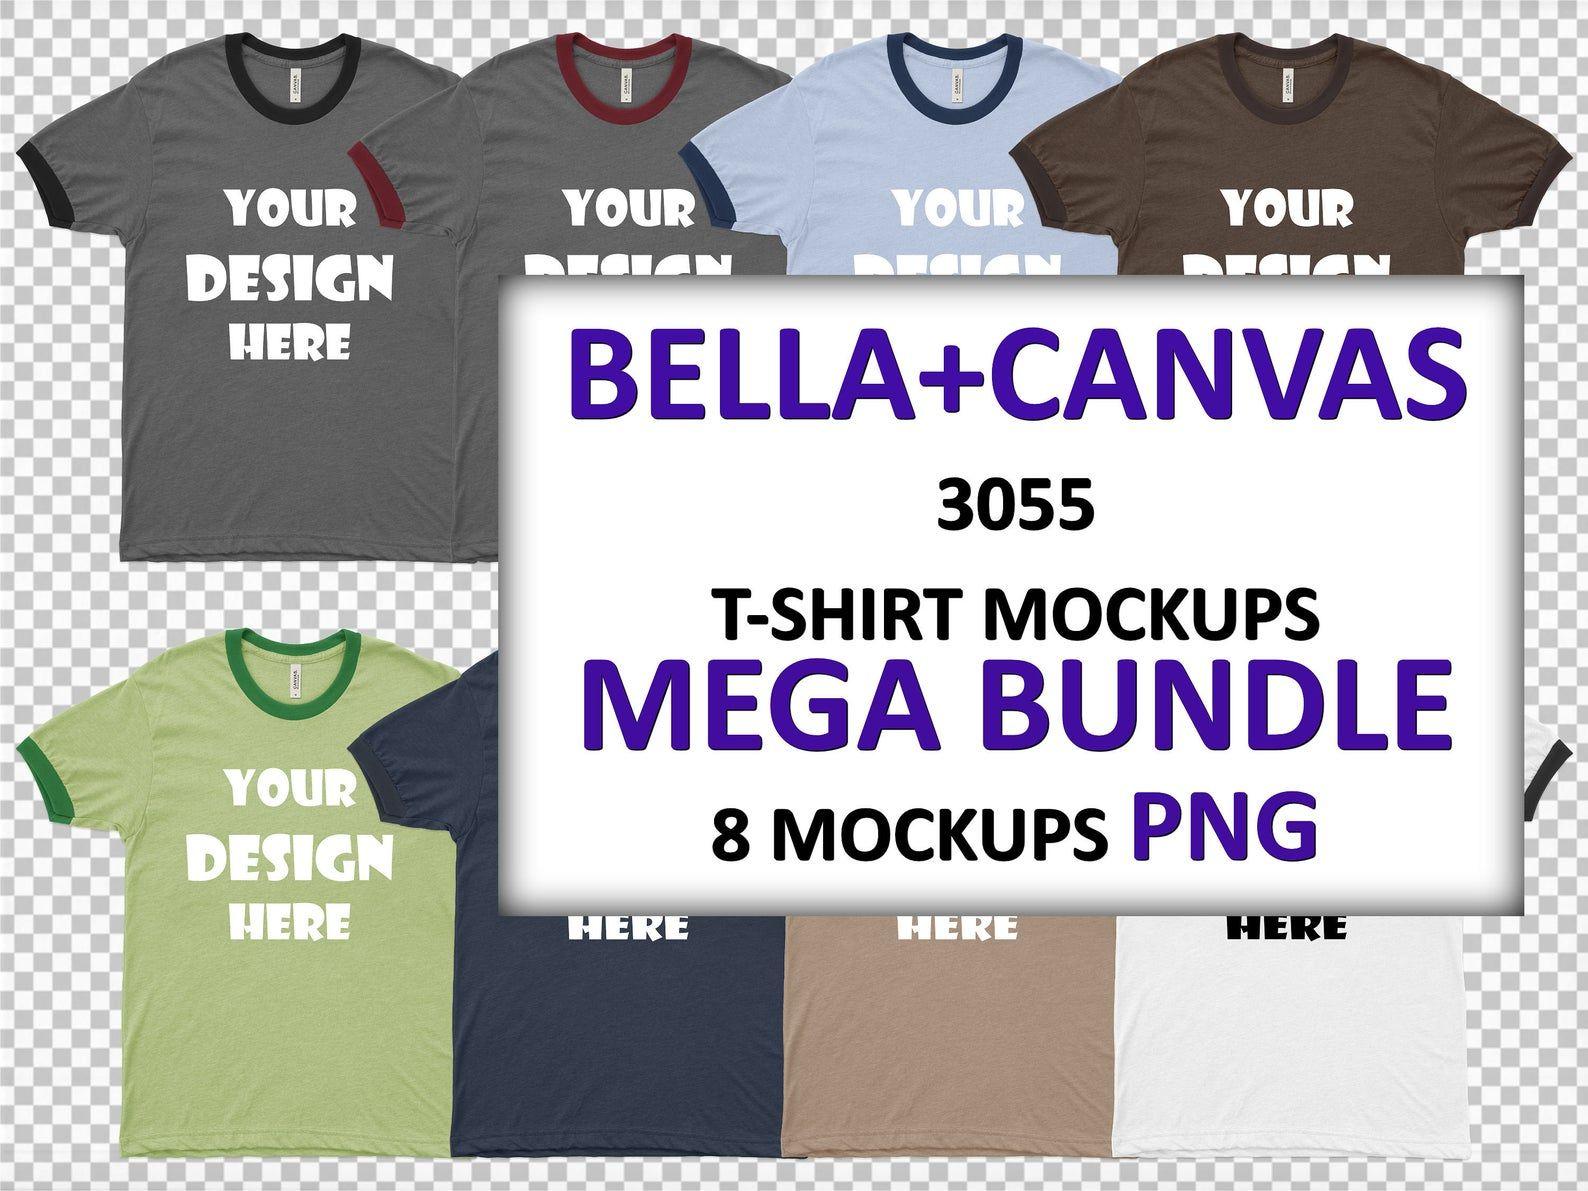 Download Png Bella Canvas 3055 Men S Jersey Short Sleeve Ringer Tee Etsy Ringer Tee Jersey Shorts Bella Canvas